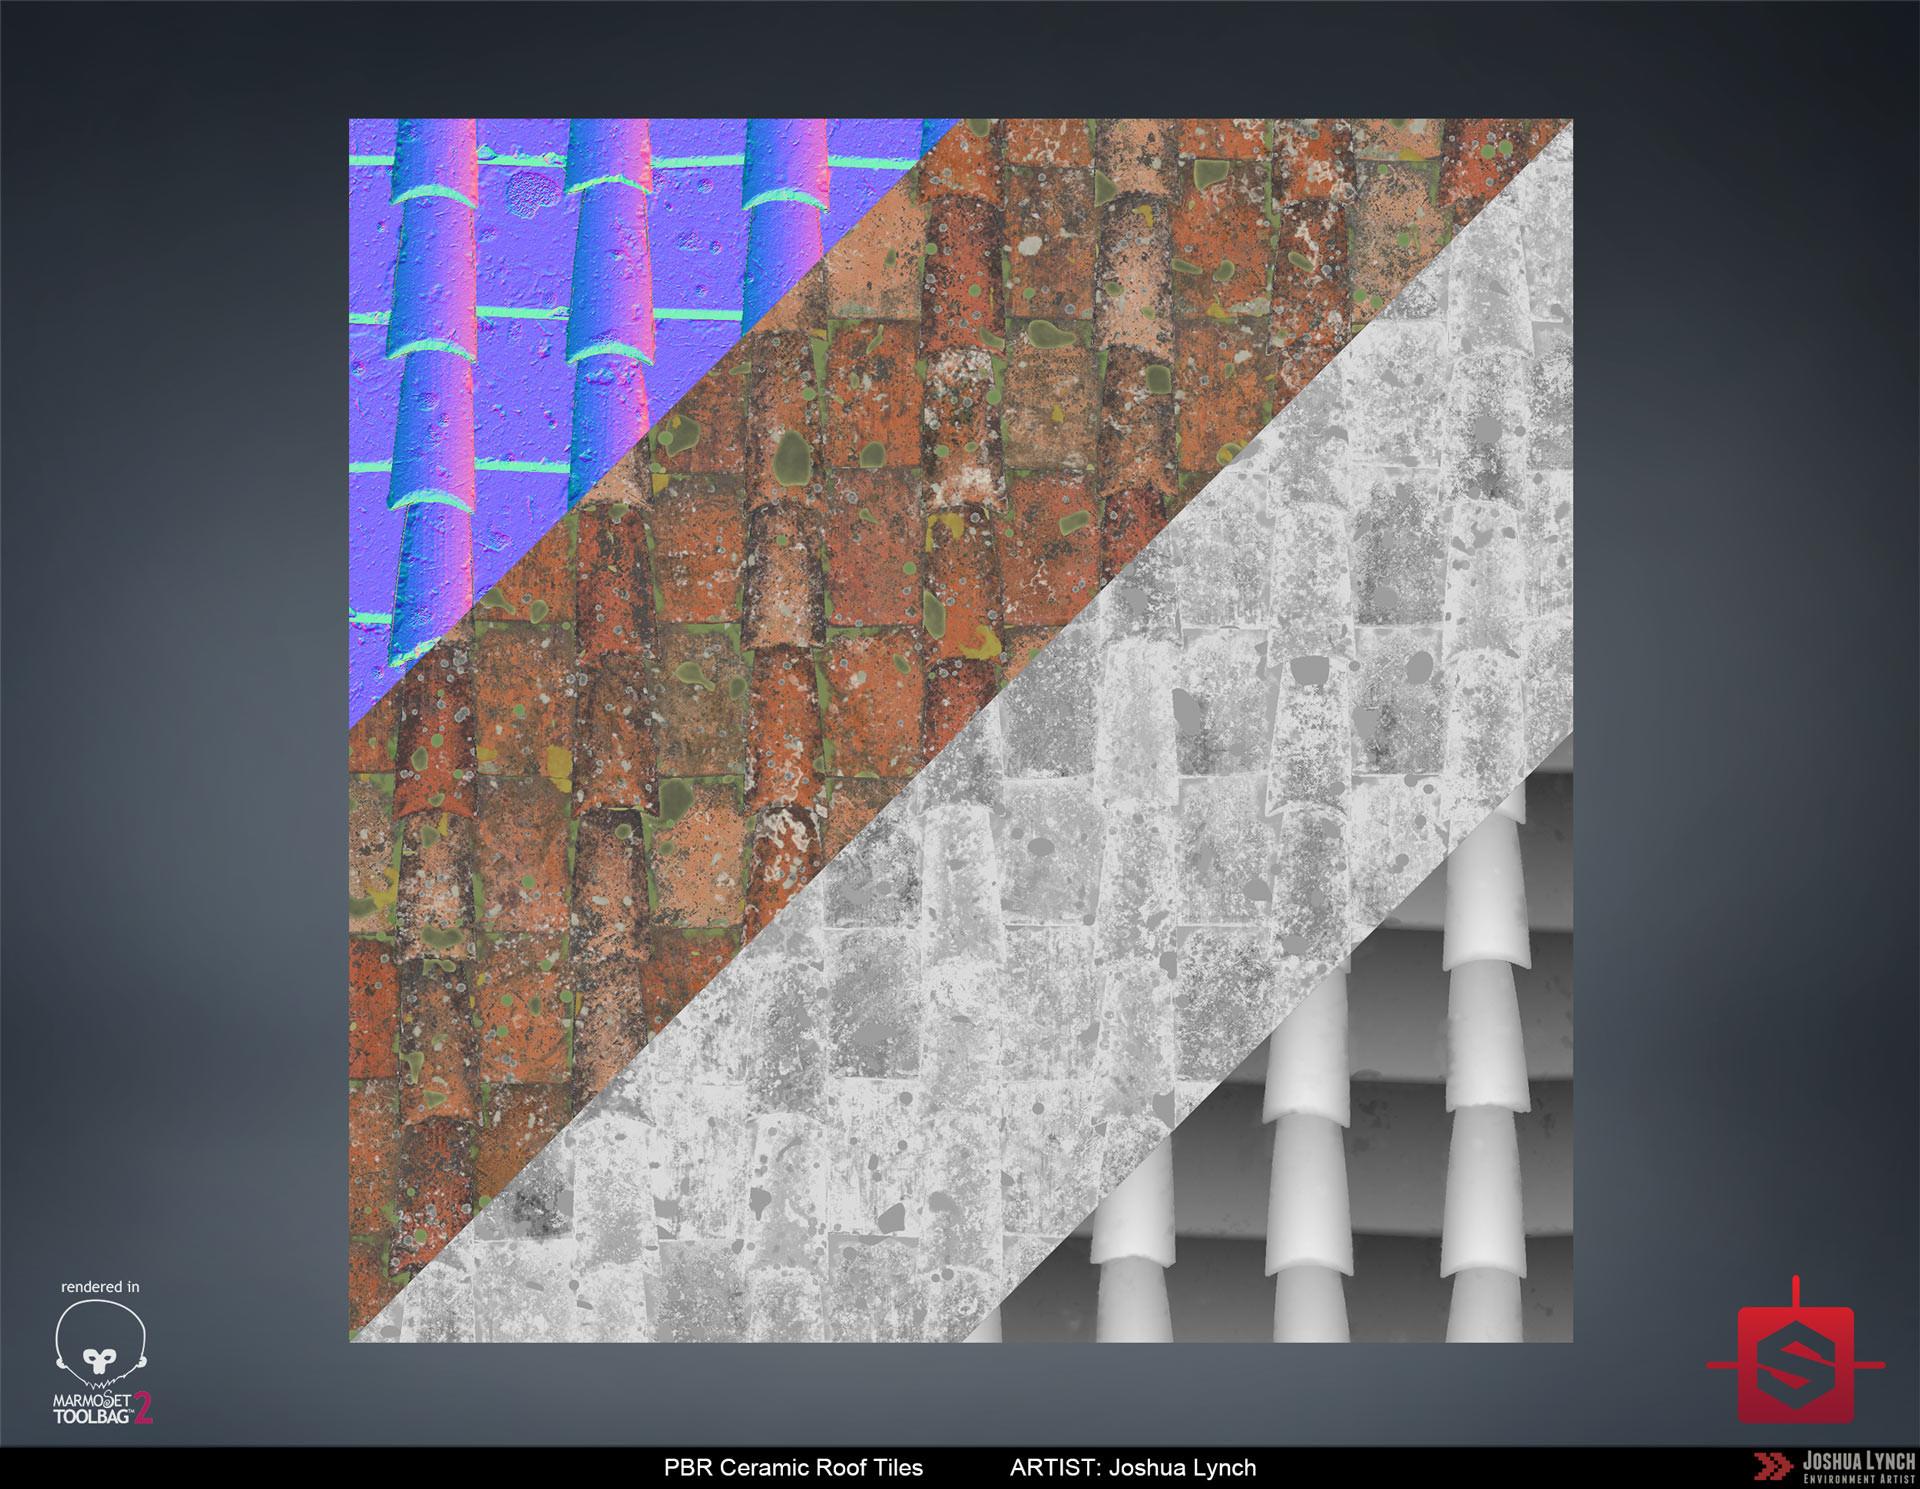 Joshua lynch roofing tiles 02 flats layout comp josh lynch